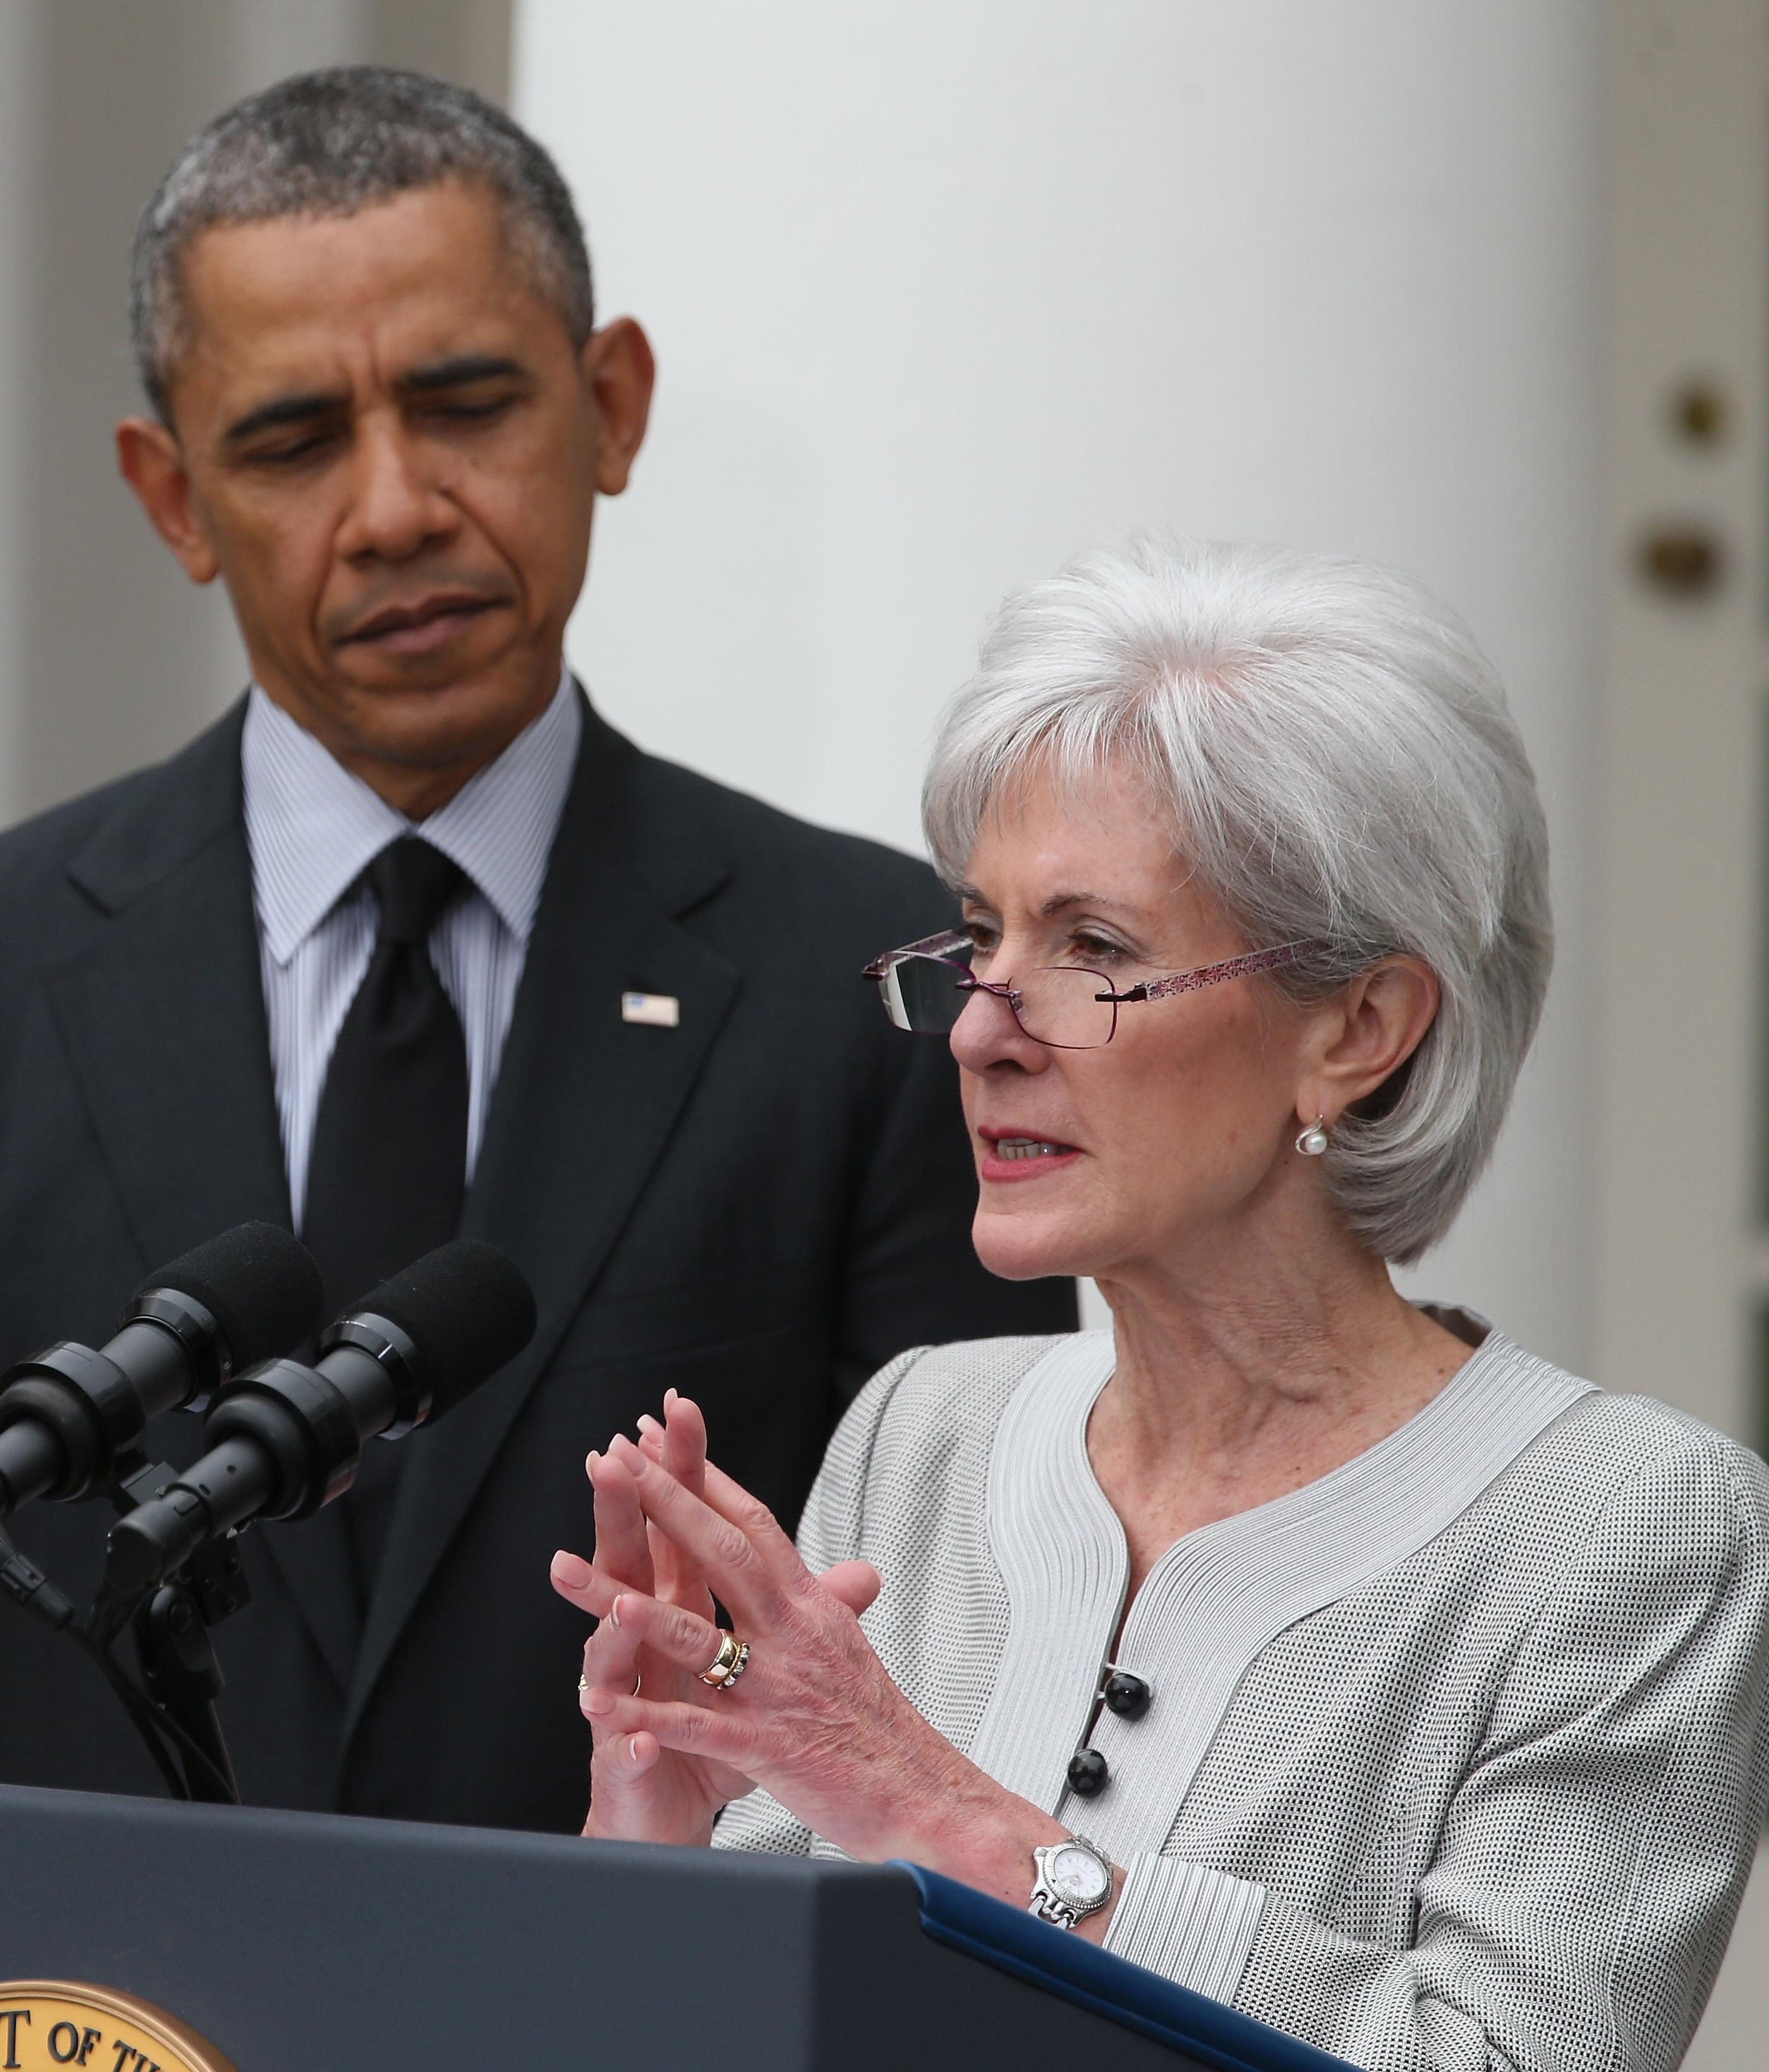 Secretary Kathleen Sebelius and President Obama on April 11, 2014 in Washington, DC.